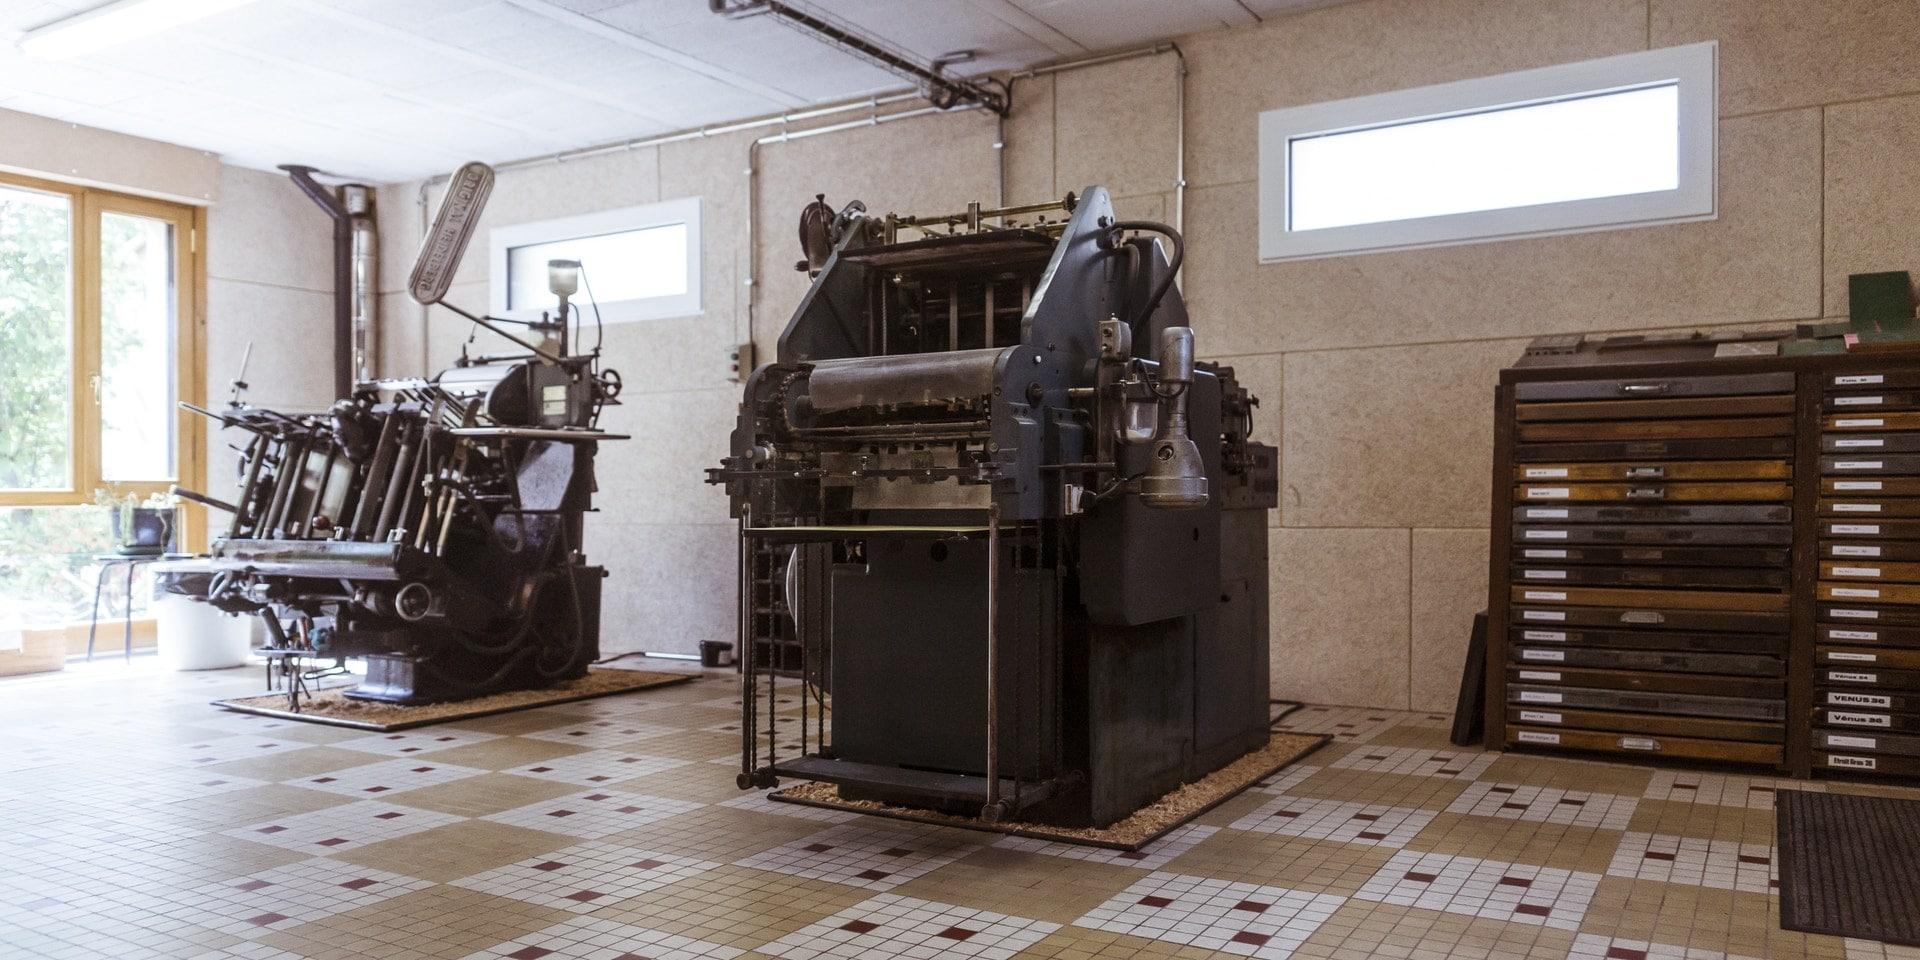 https://www.marques-de-france.fr/wp-content/uploads/2019/04/Calepino_atelier2.jpg